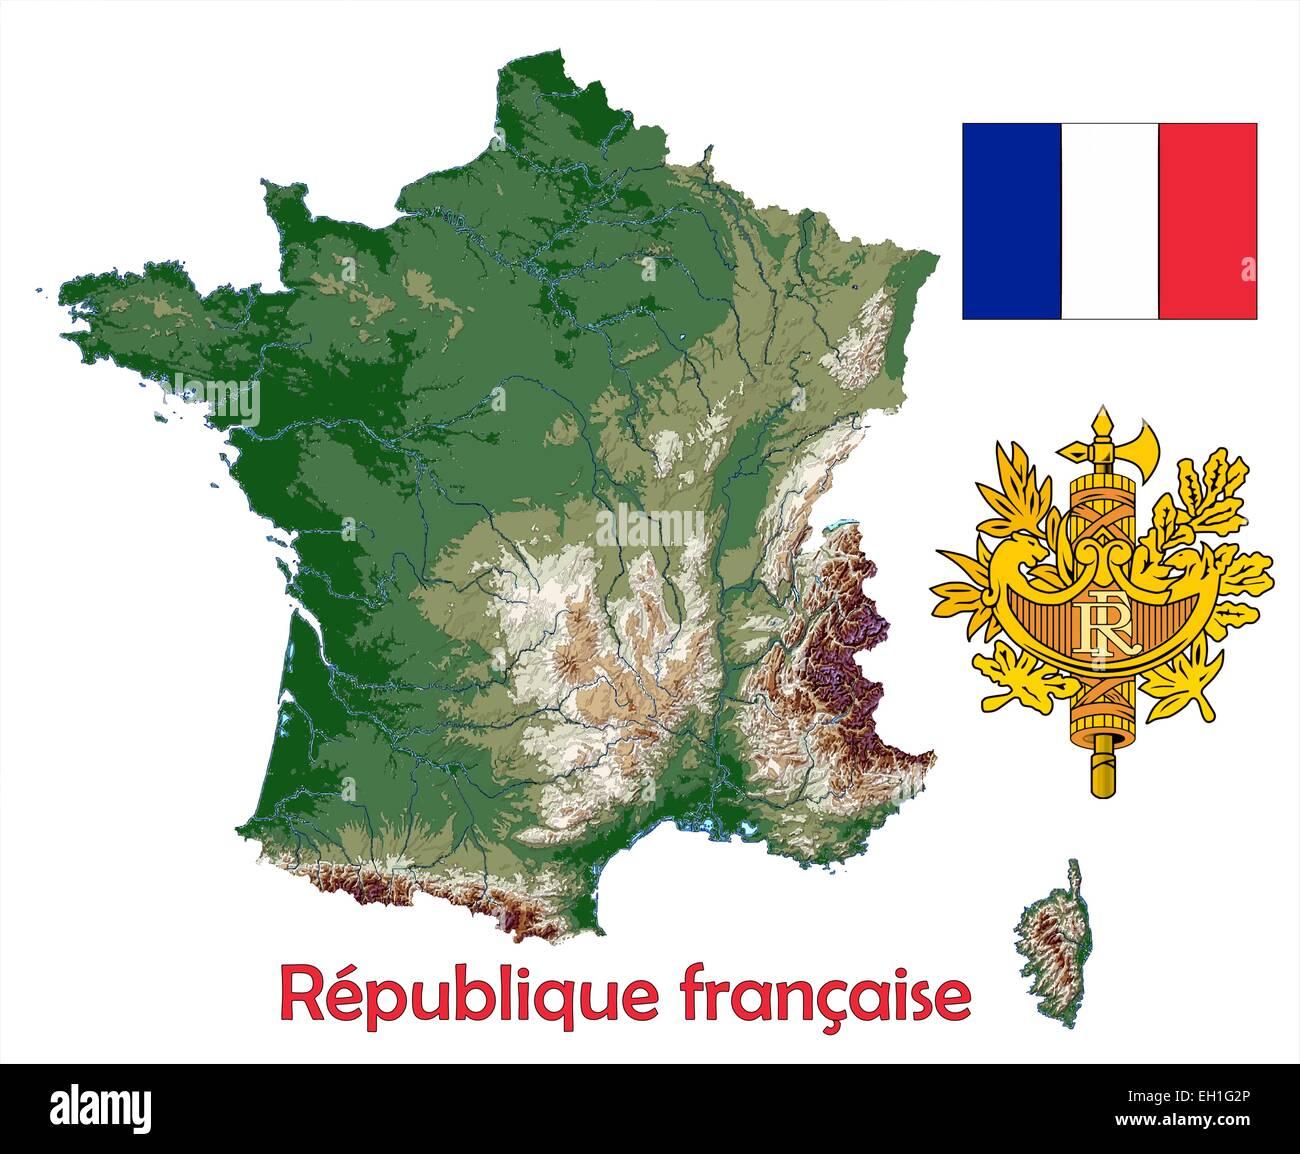 Frankreich Karte Stockfotos & Frankreich Karte Bilder - Alamy